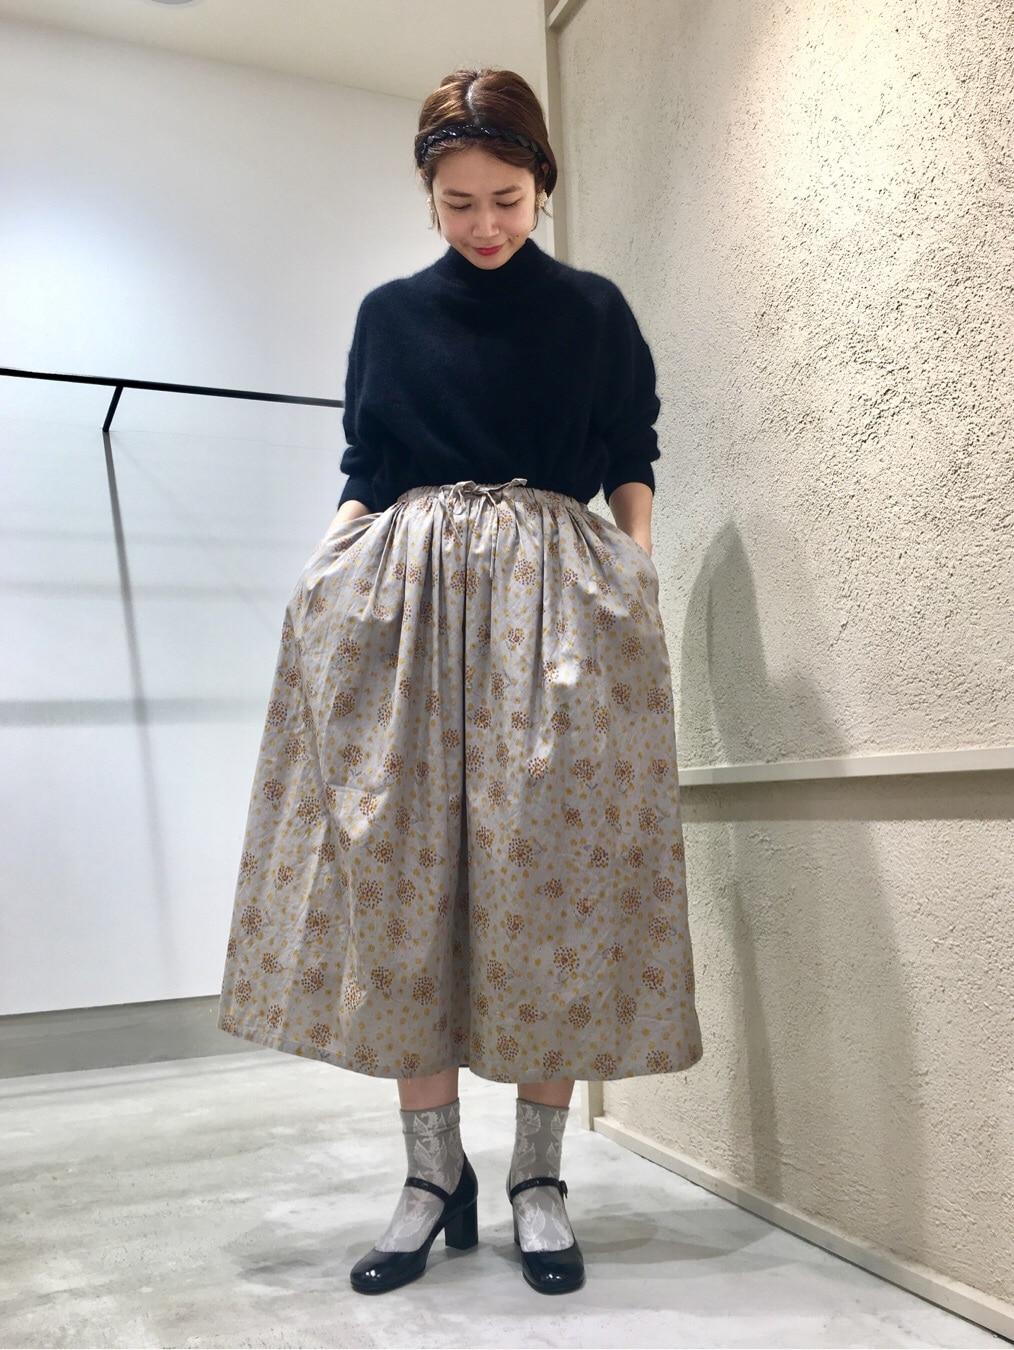 chambre de charme 横浜ジョイナス 身長:160cm 2020.12.25